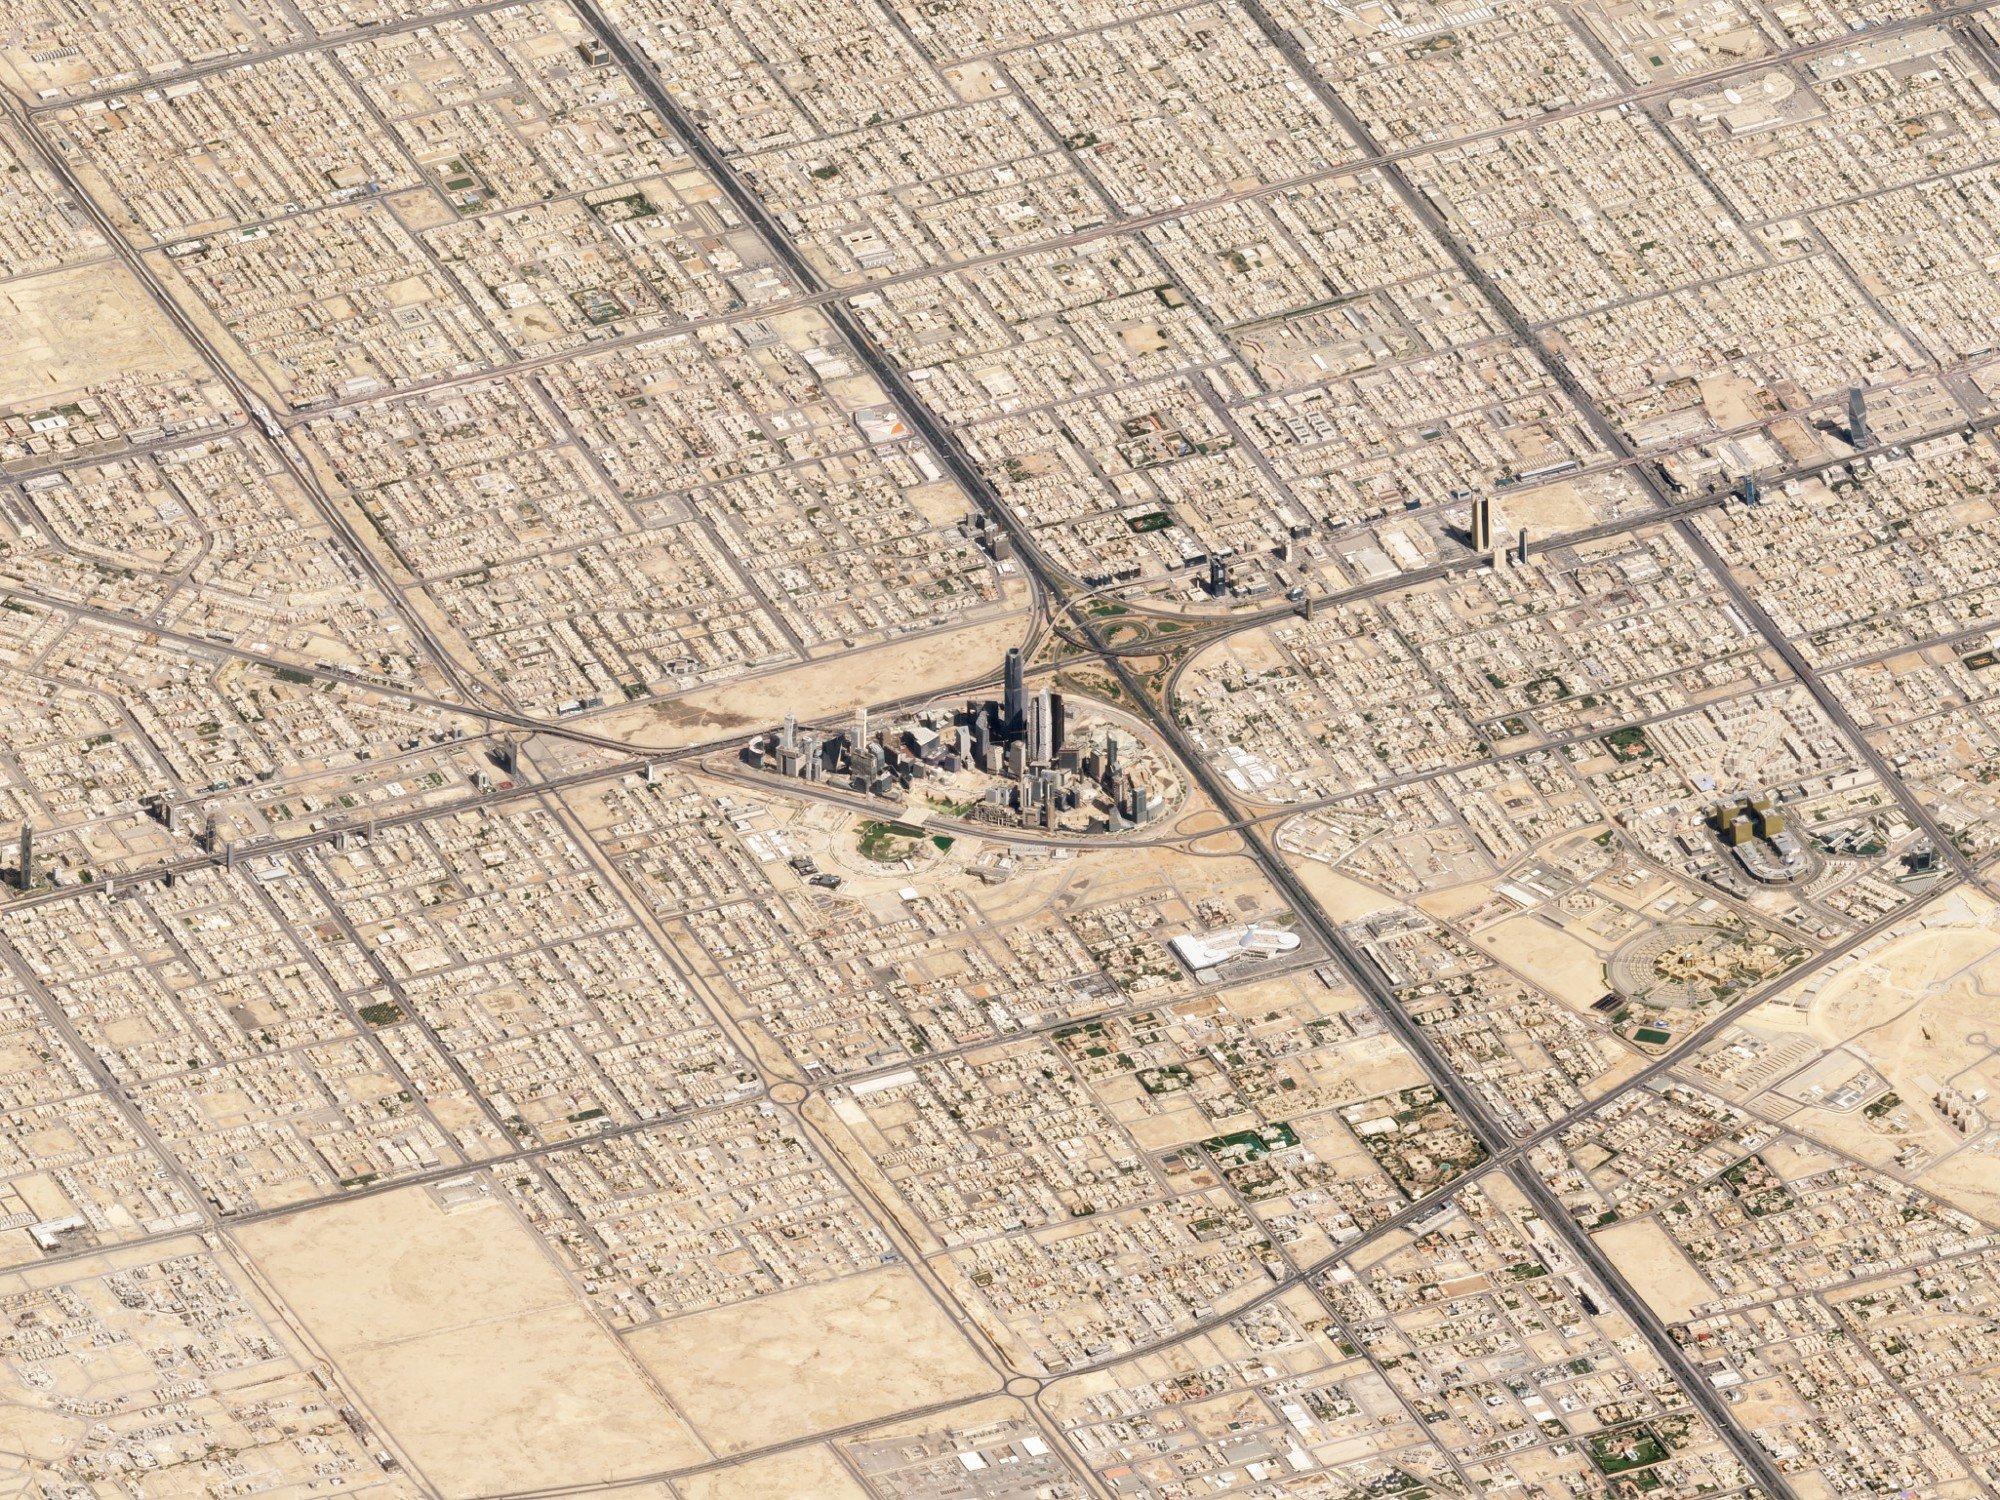 Riyadh, Saudi Arabia. March 10, 2018. Image ©2018 Planet Labs, Inc. cc-by-sa4.0.